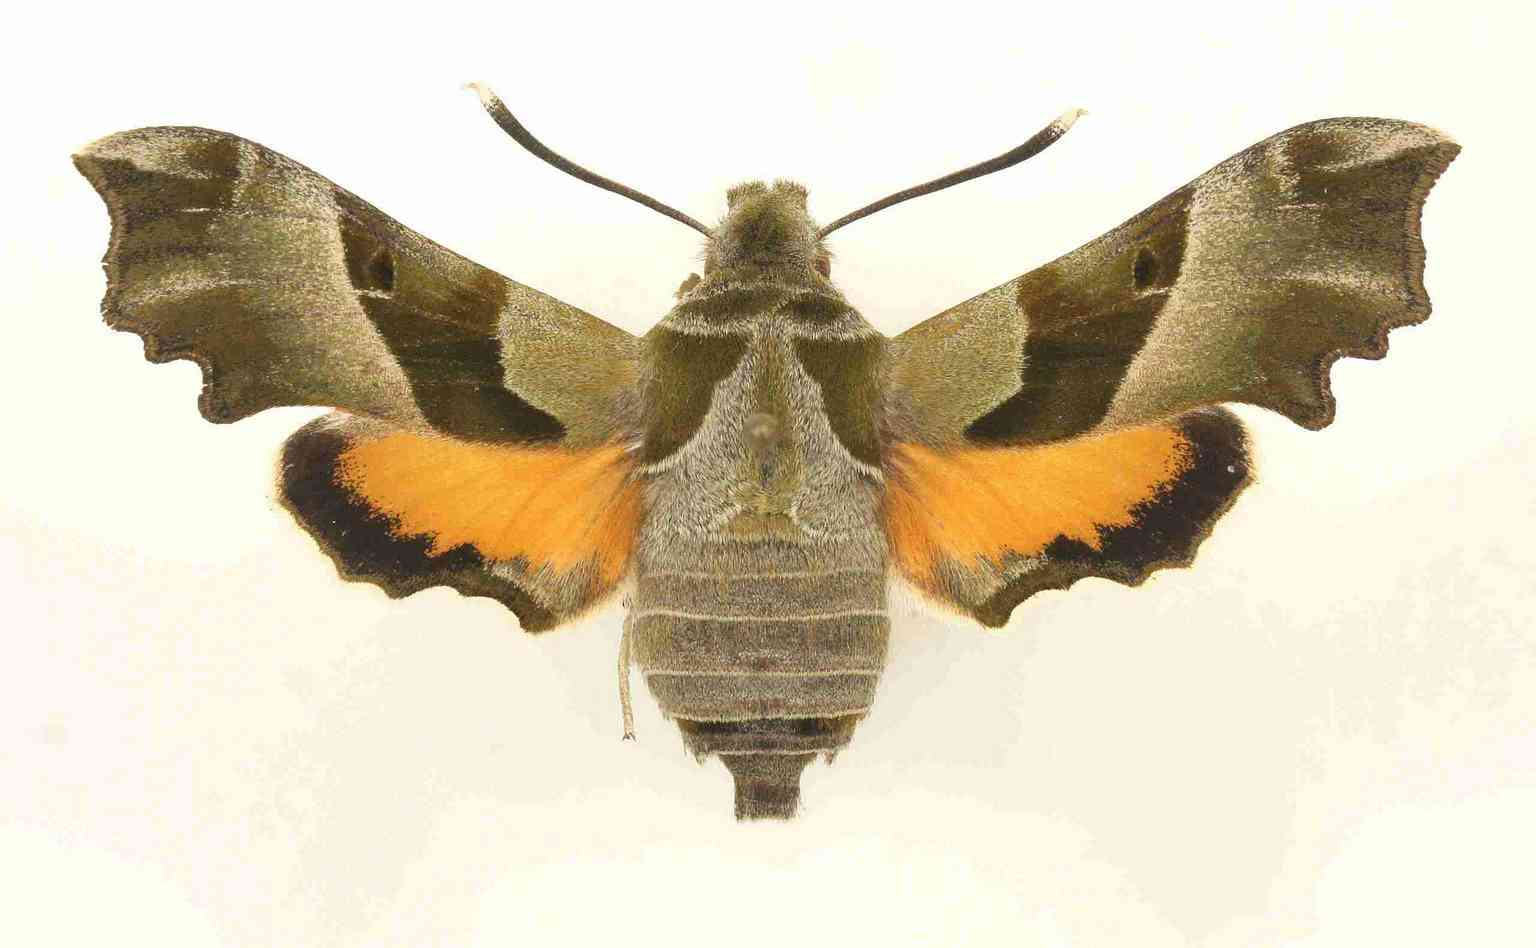 Proserpinus proserpina imago femelle